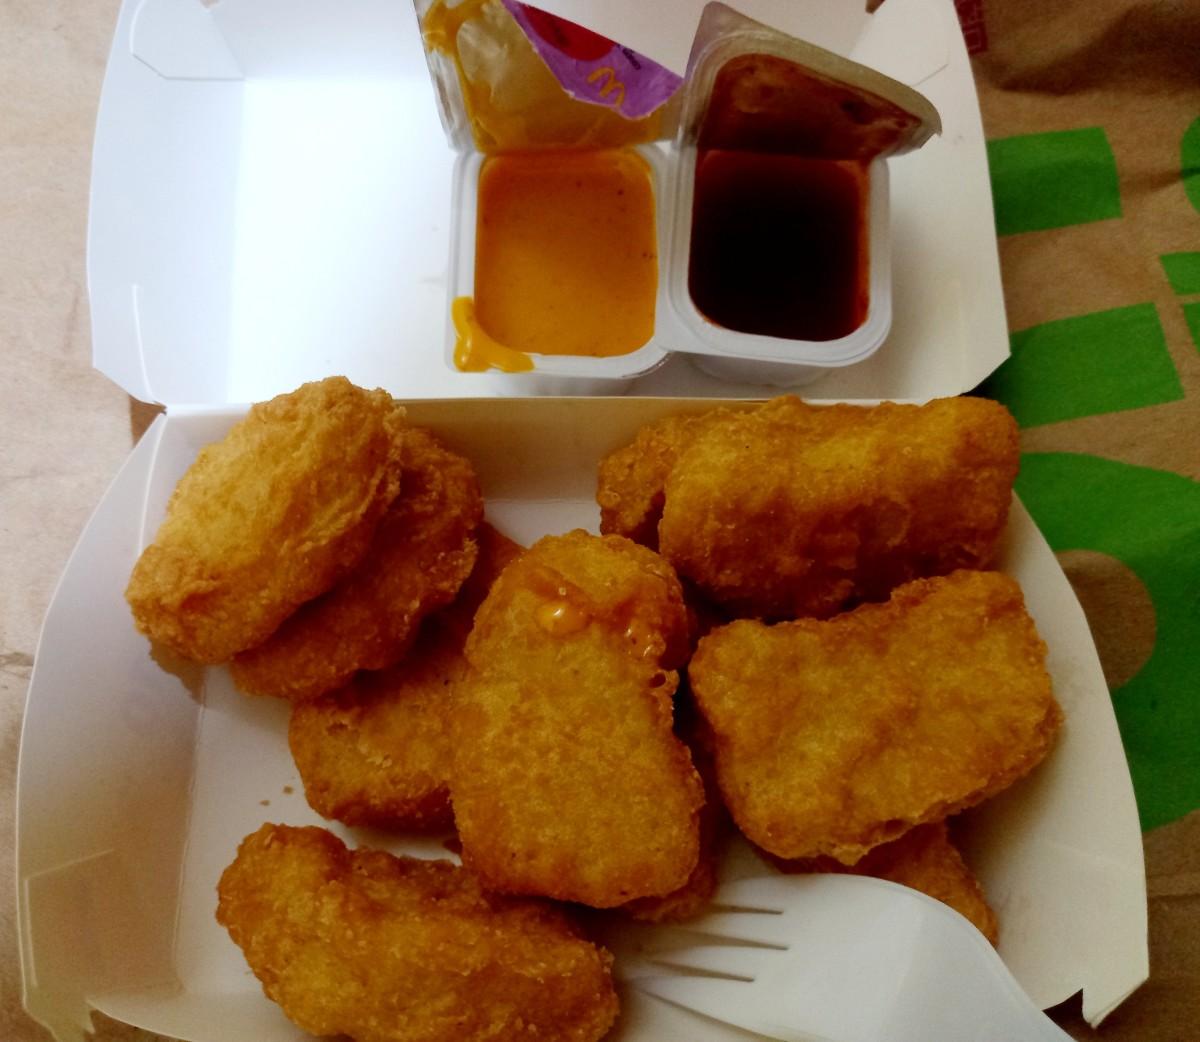 food-review-mcdonalds-bts-meal